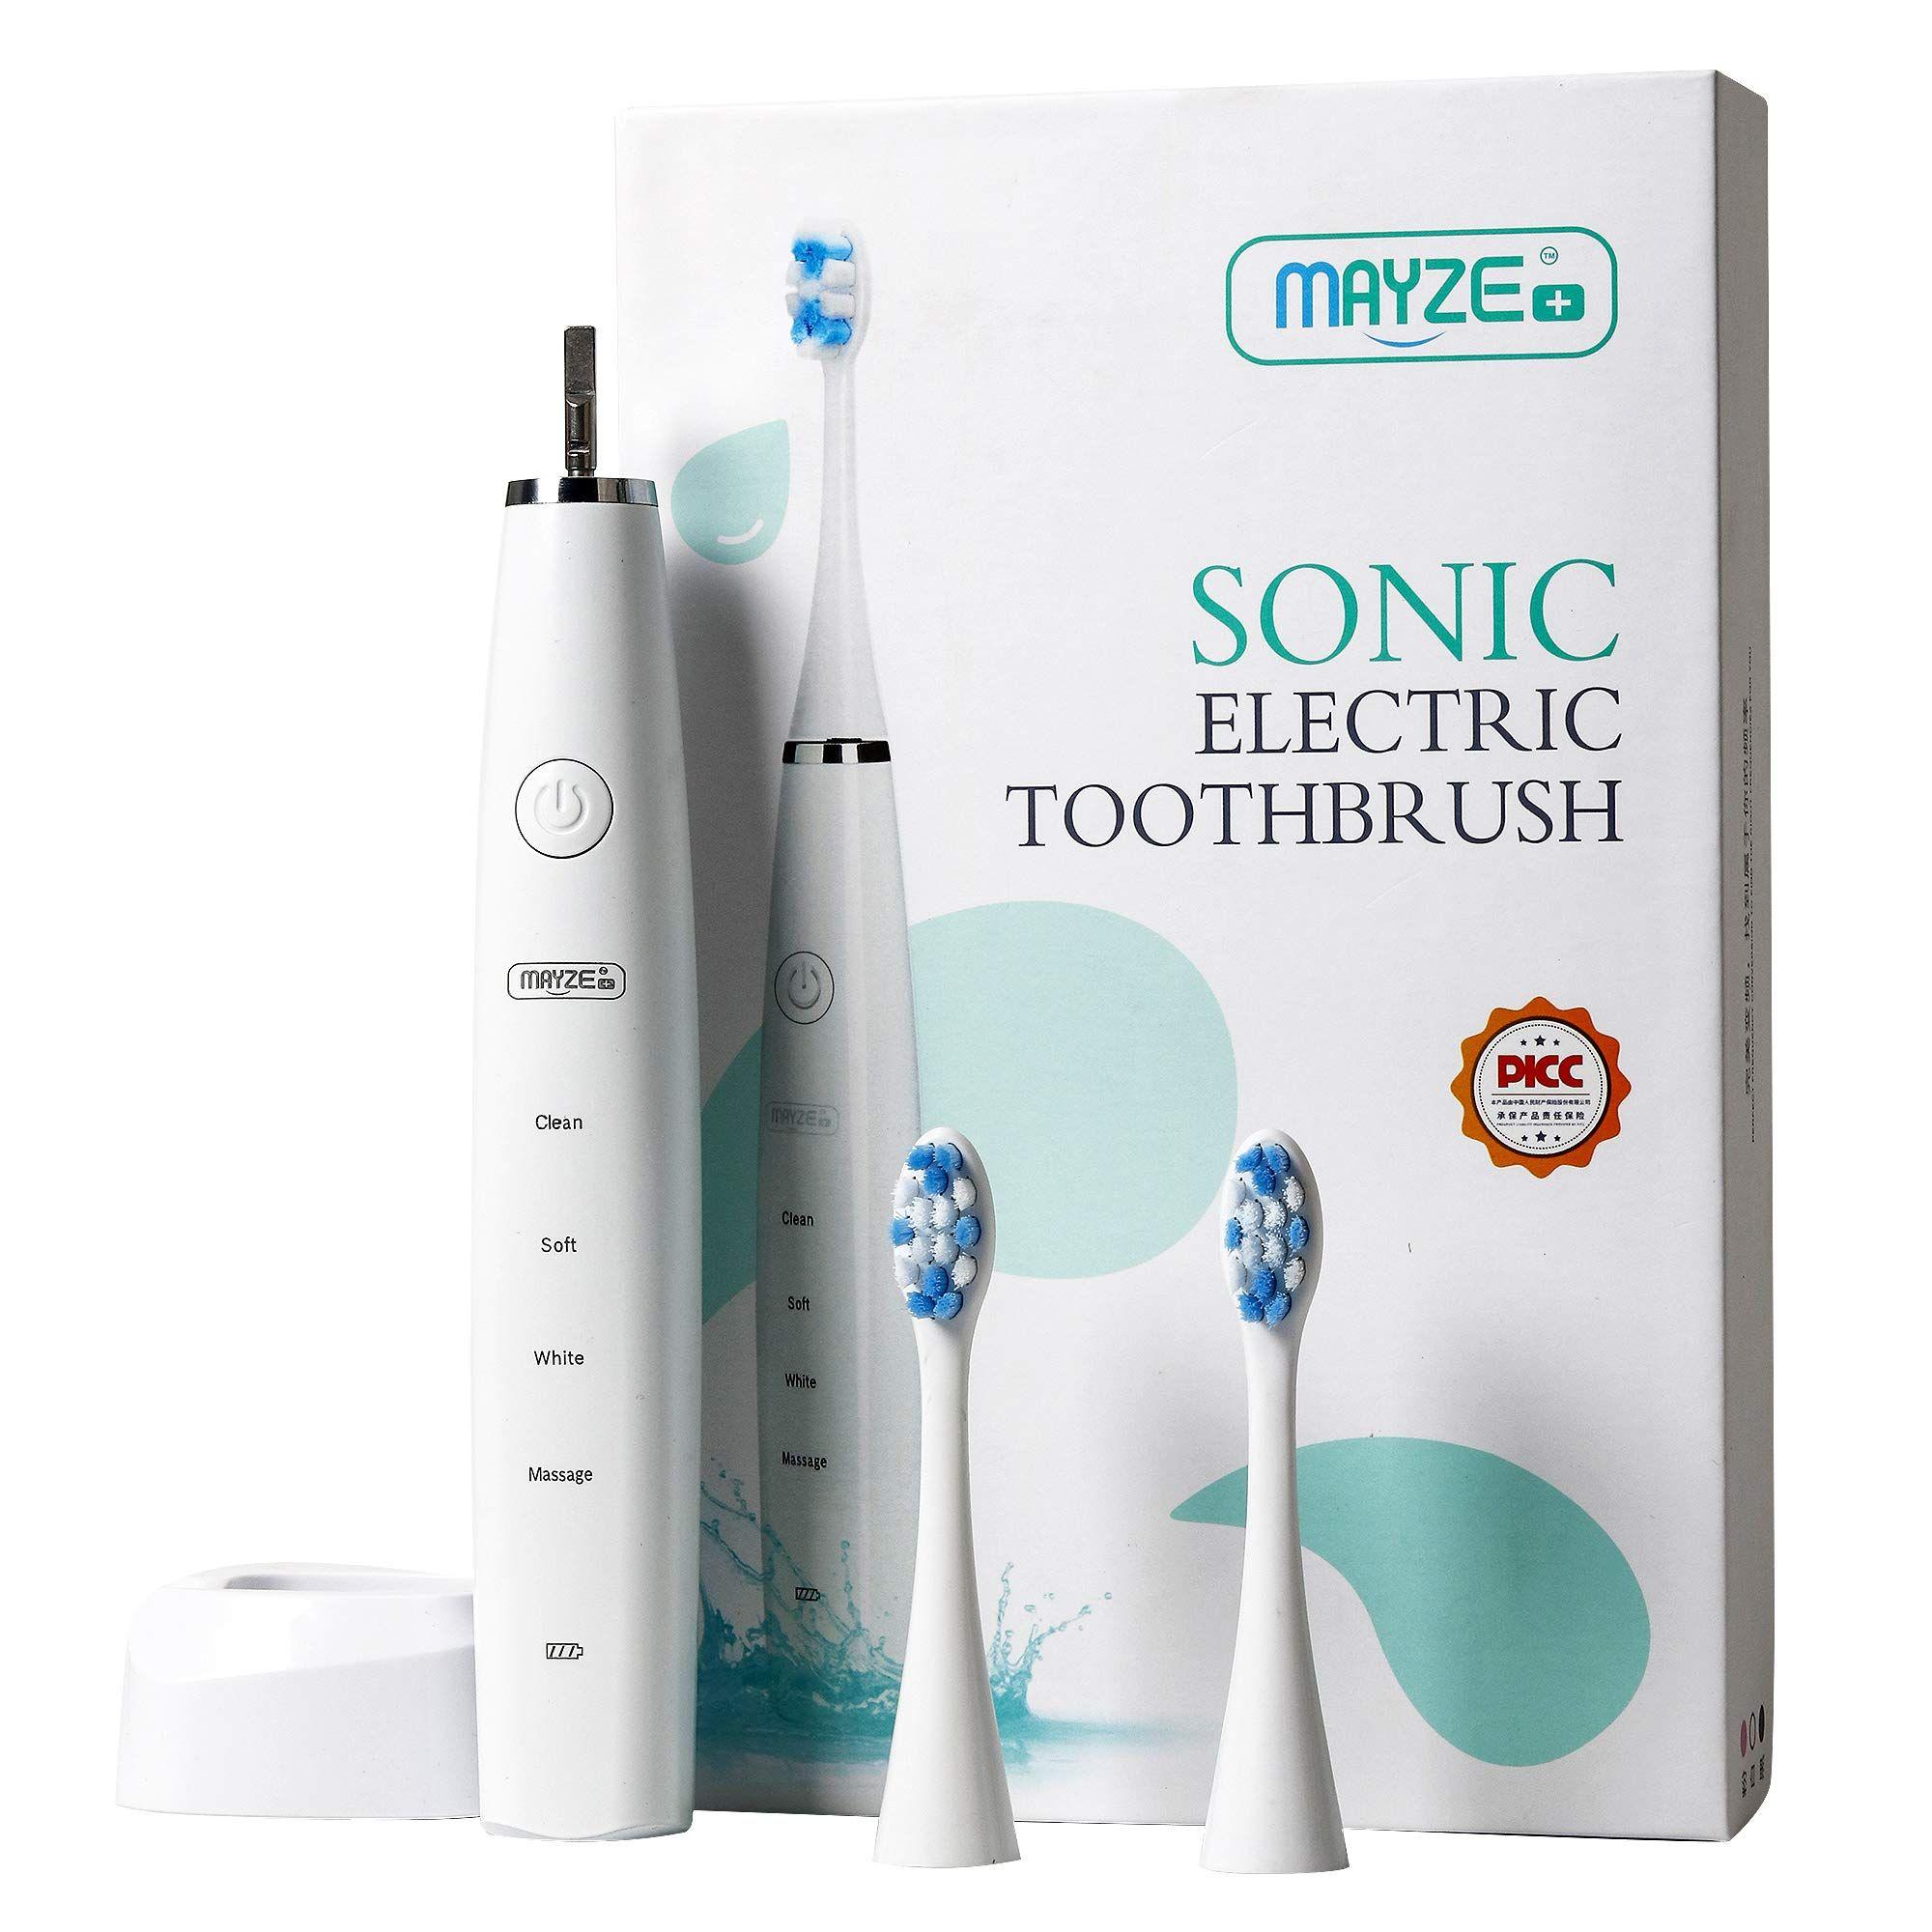 Rechargeable Sonic Electric Toothbrush Charging Base 4 Optional Modes Waterproof Elecforu Produtividade